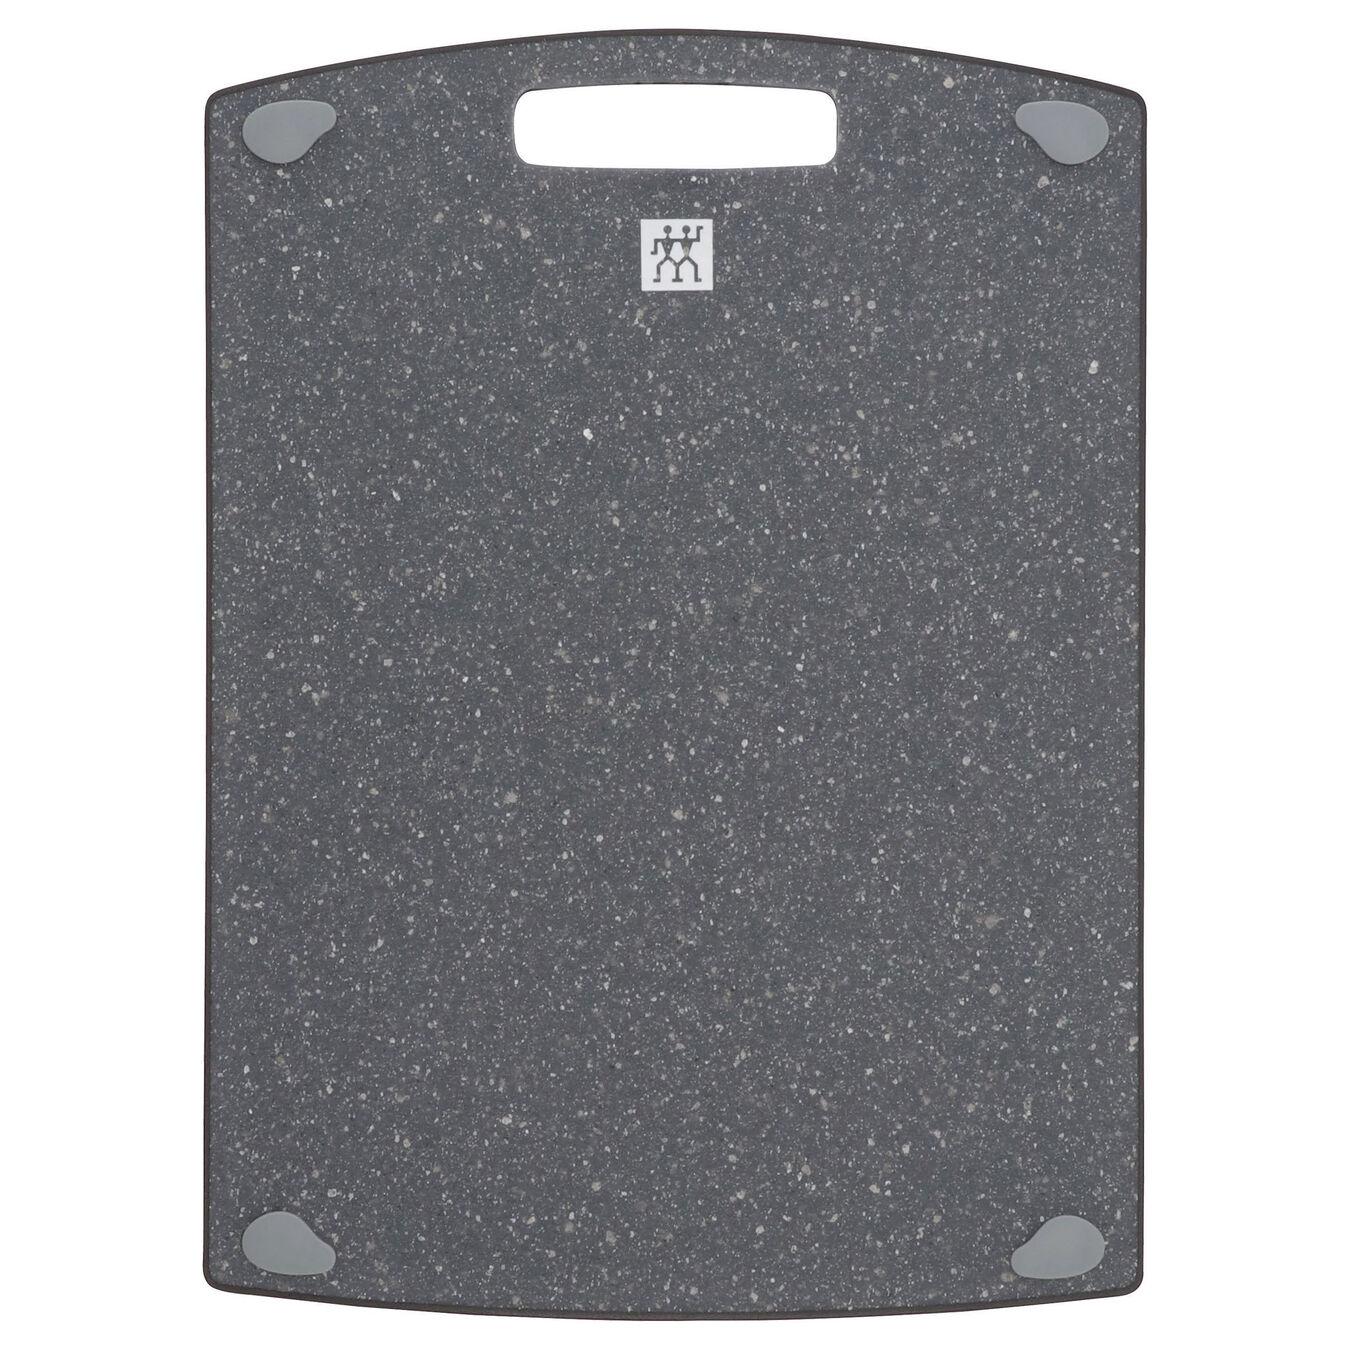 2 pc. Cutting board set, Plastic | 36 cm x 20 cm & 37 cm x 27 cm 36 cm x 20 cm,,large 4